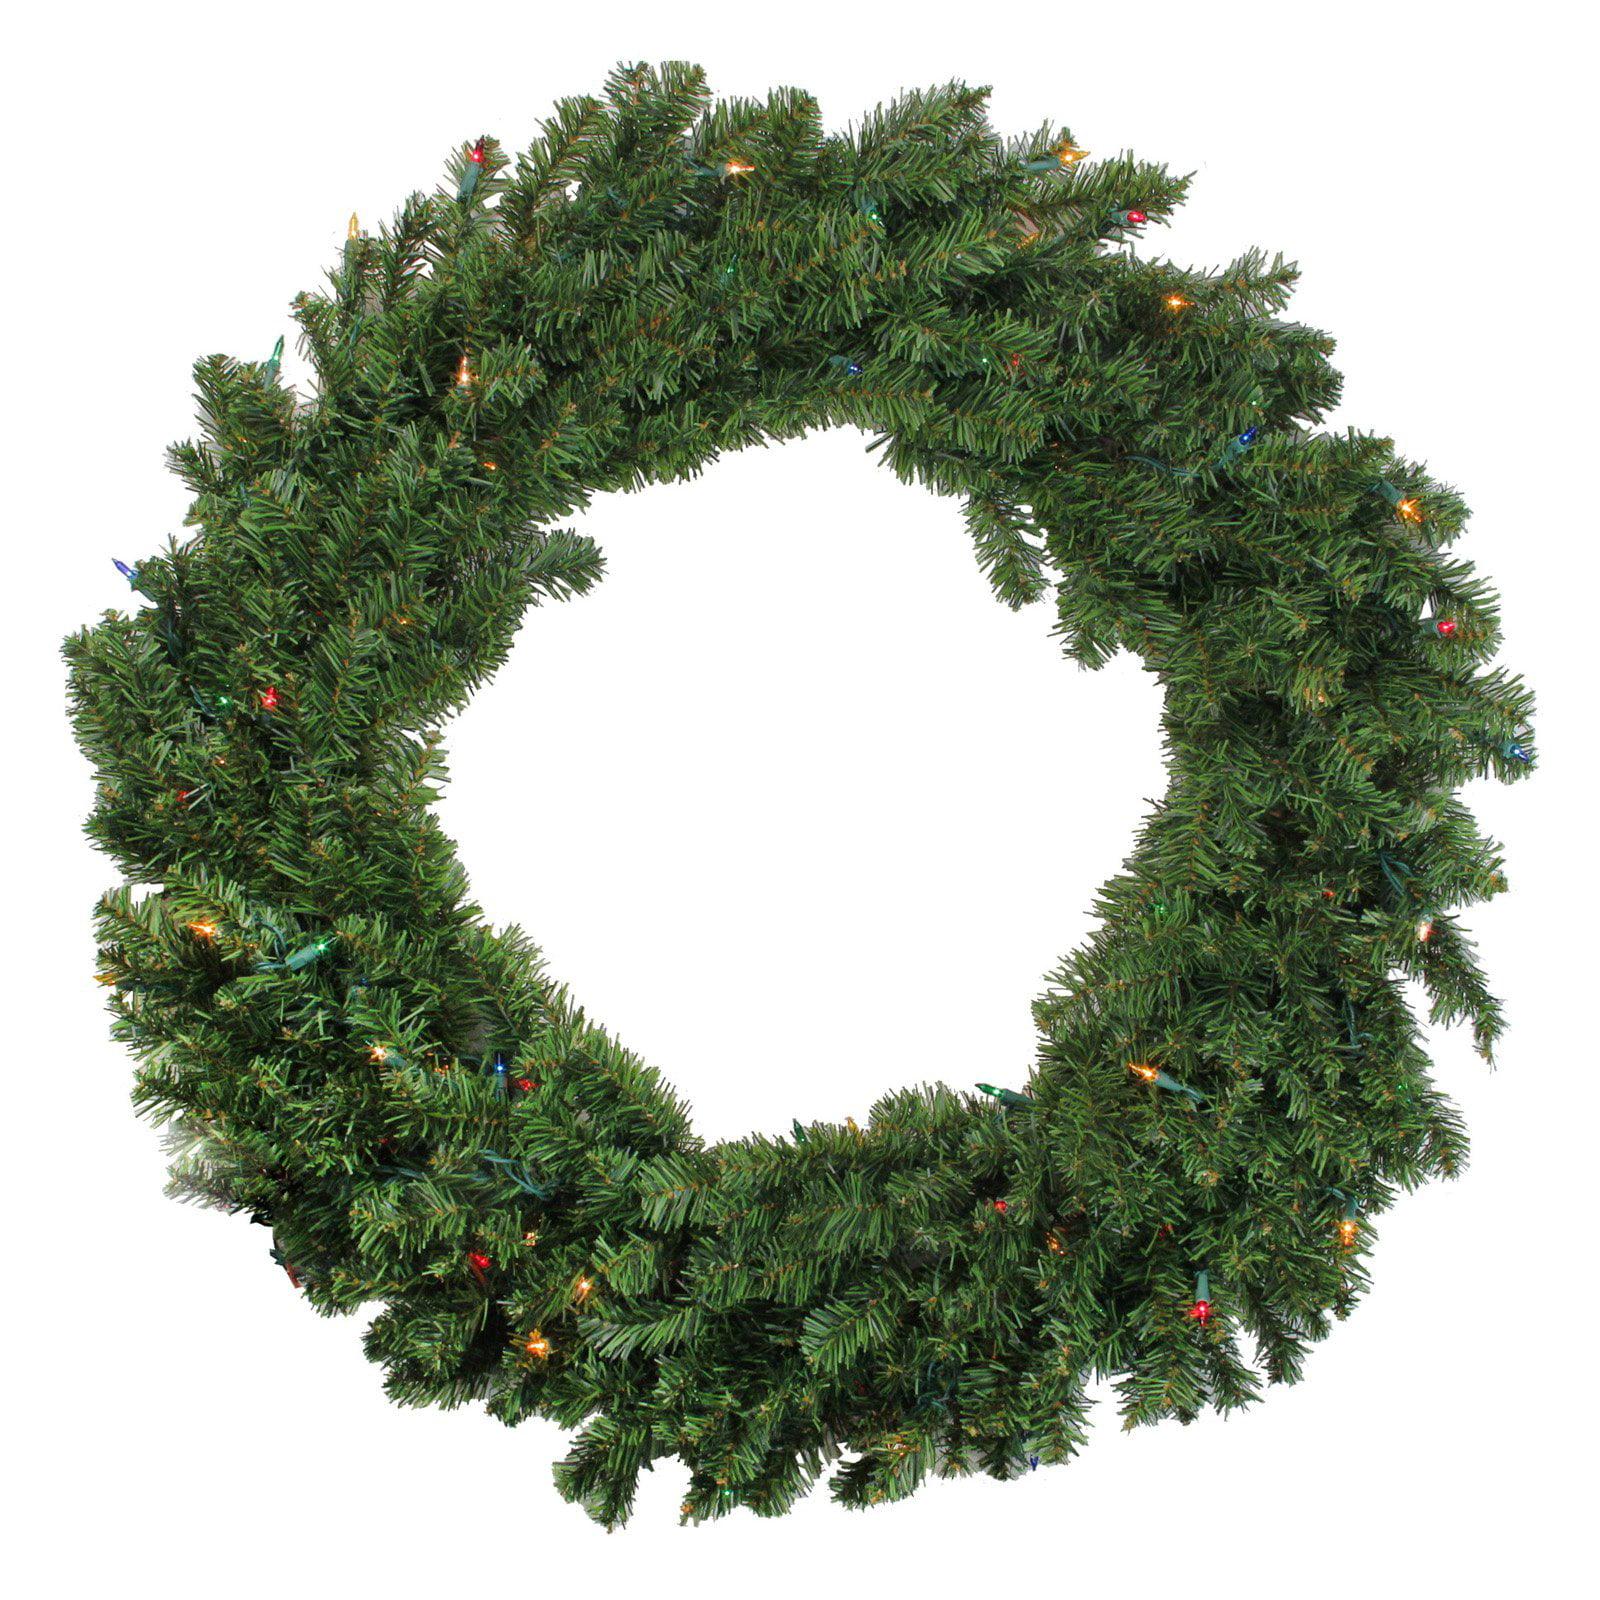 Darice Pre Lit Canadian Pine Christmas Wreath